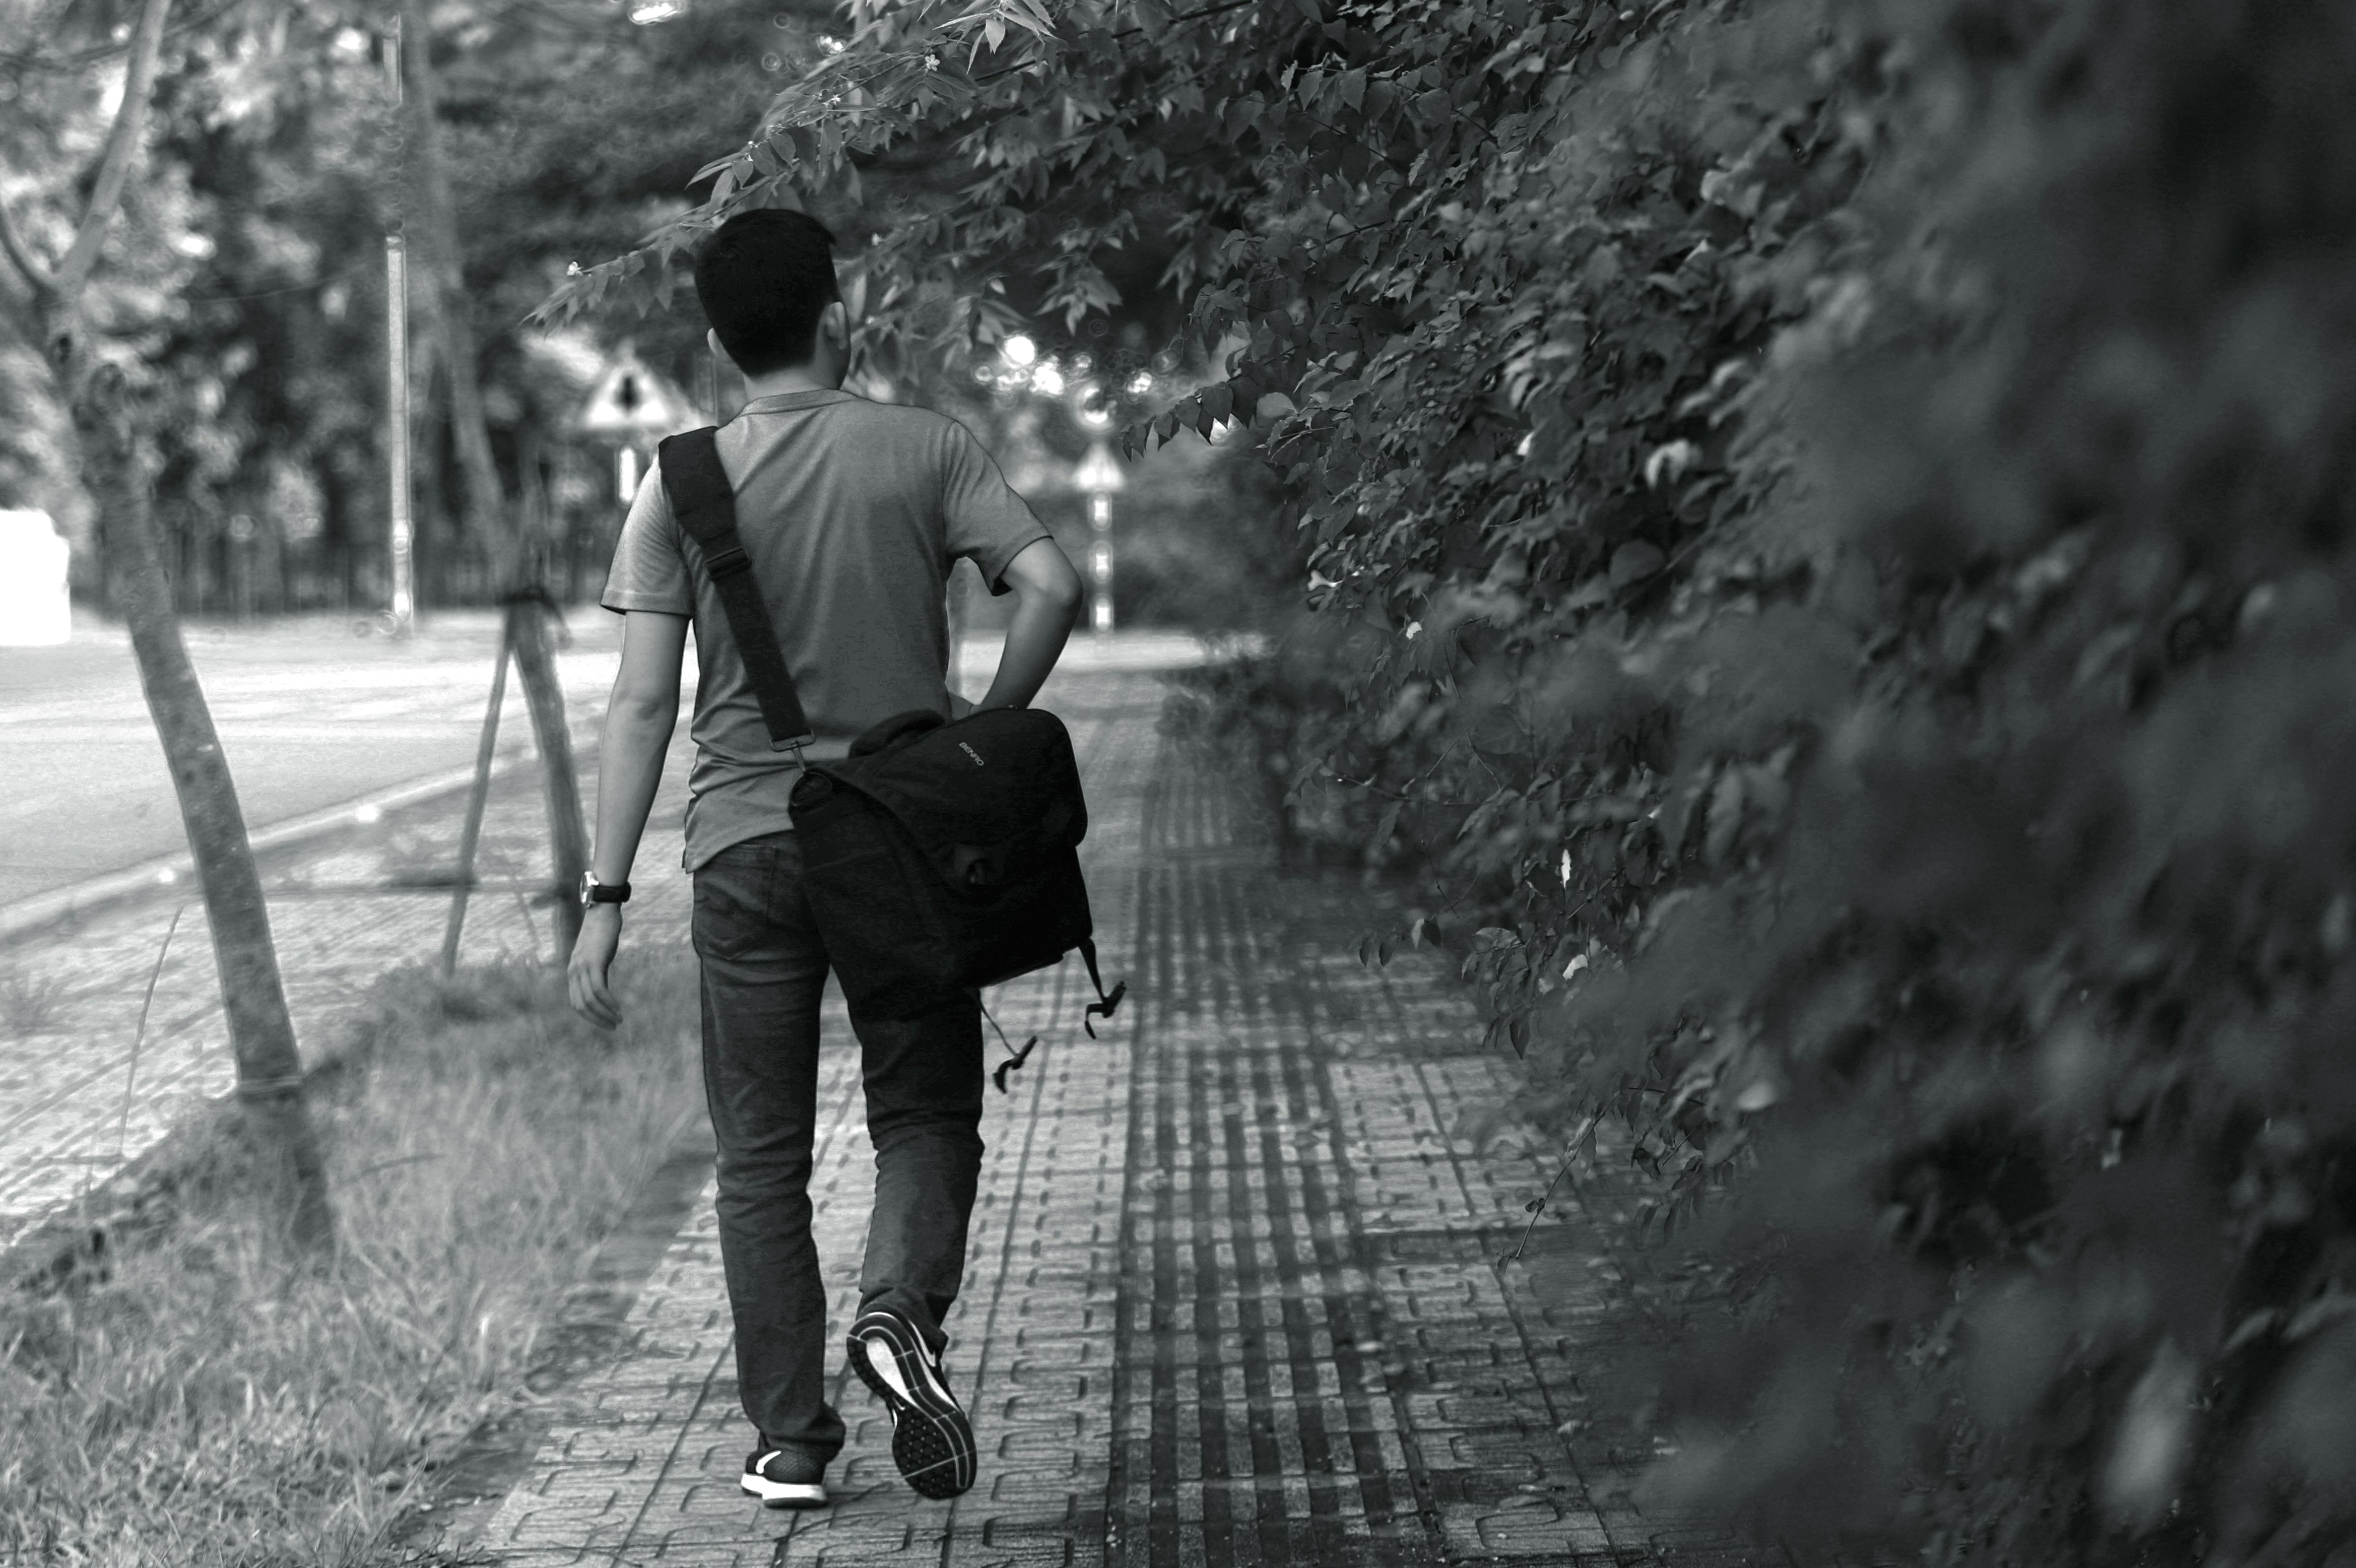 Man Wearing T-shirt; Pants; Crossbody Bag, Adult, Bag, Black-and-white, Boy, HQ Photo